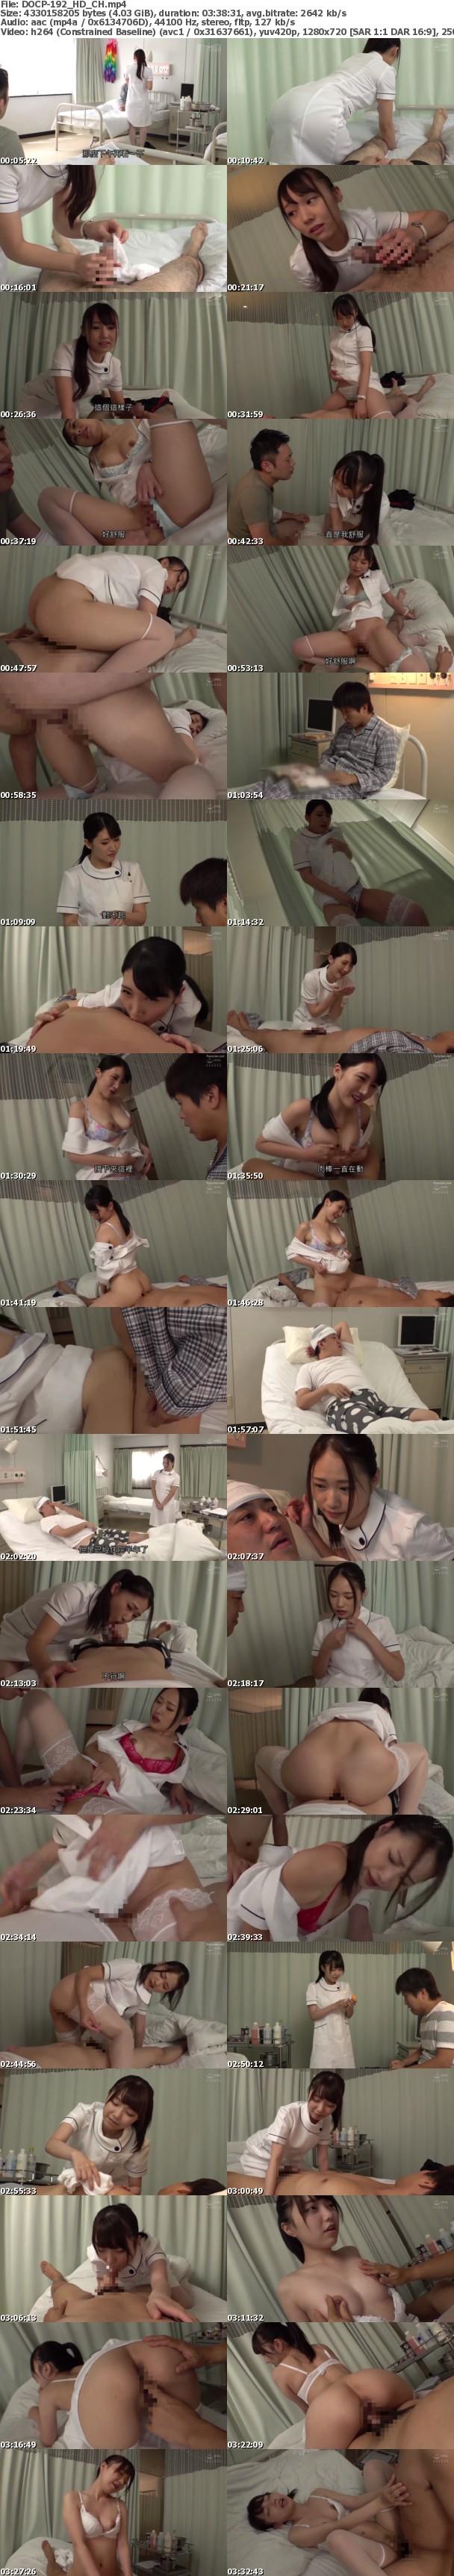 (HD) DOCP-192 「天使!?小惡魔!?」美麗護士其實欲求不滿!用榨取精子睾丸騎乘位緊緊抱住我的肉棒 讓我持續高潮。[有碼高清中文字幕]